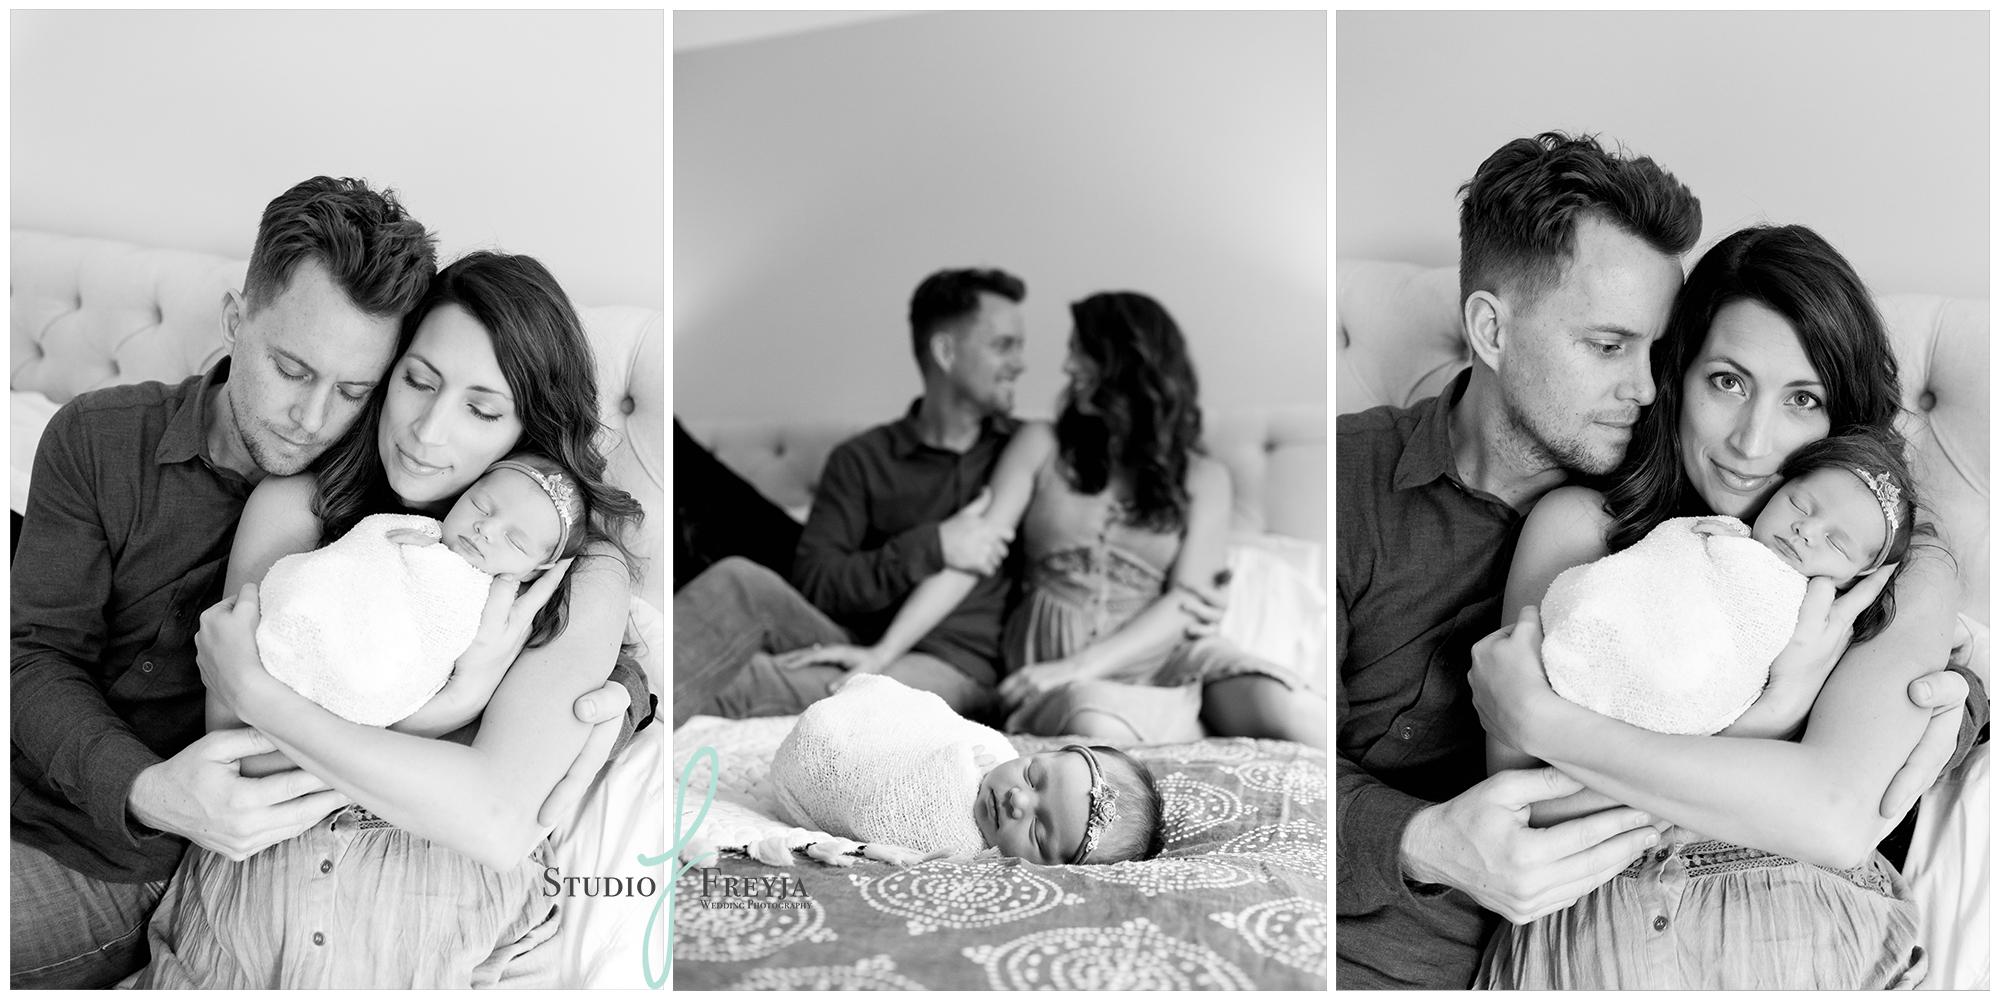 Parents Image Collage by San Diego Newborn Photographer